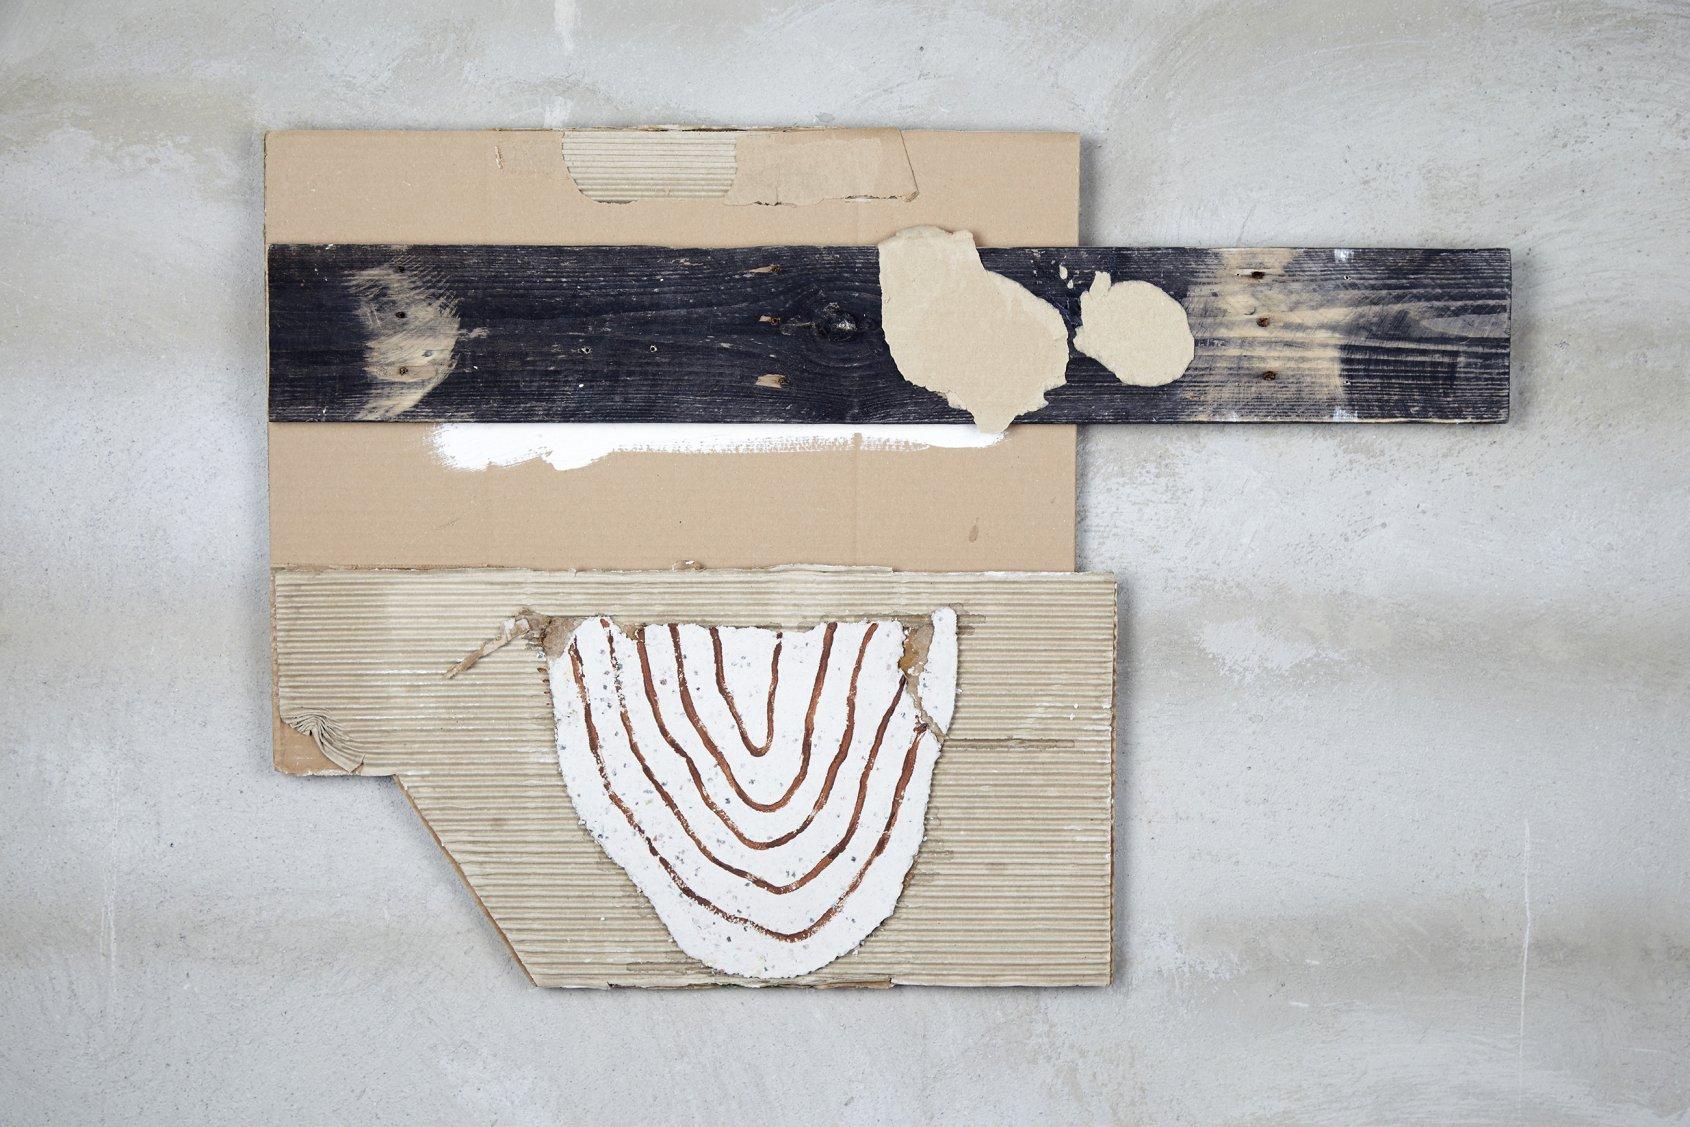 Paisatges somniats III (2015) - Joan Callergues Cabedo